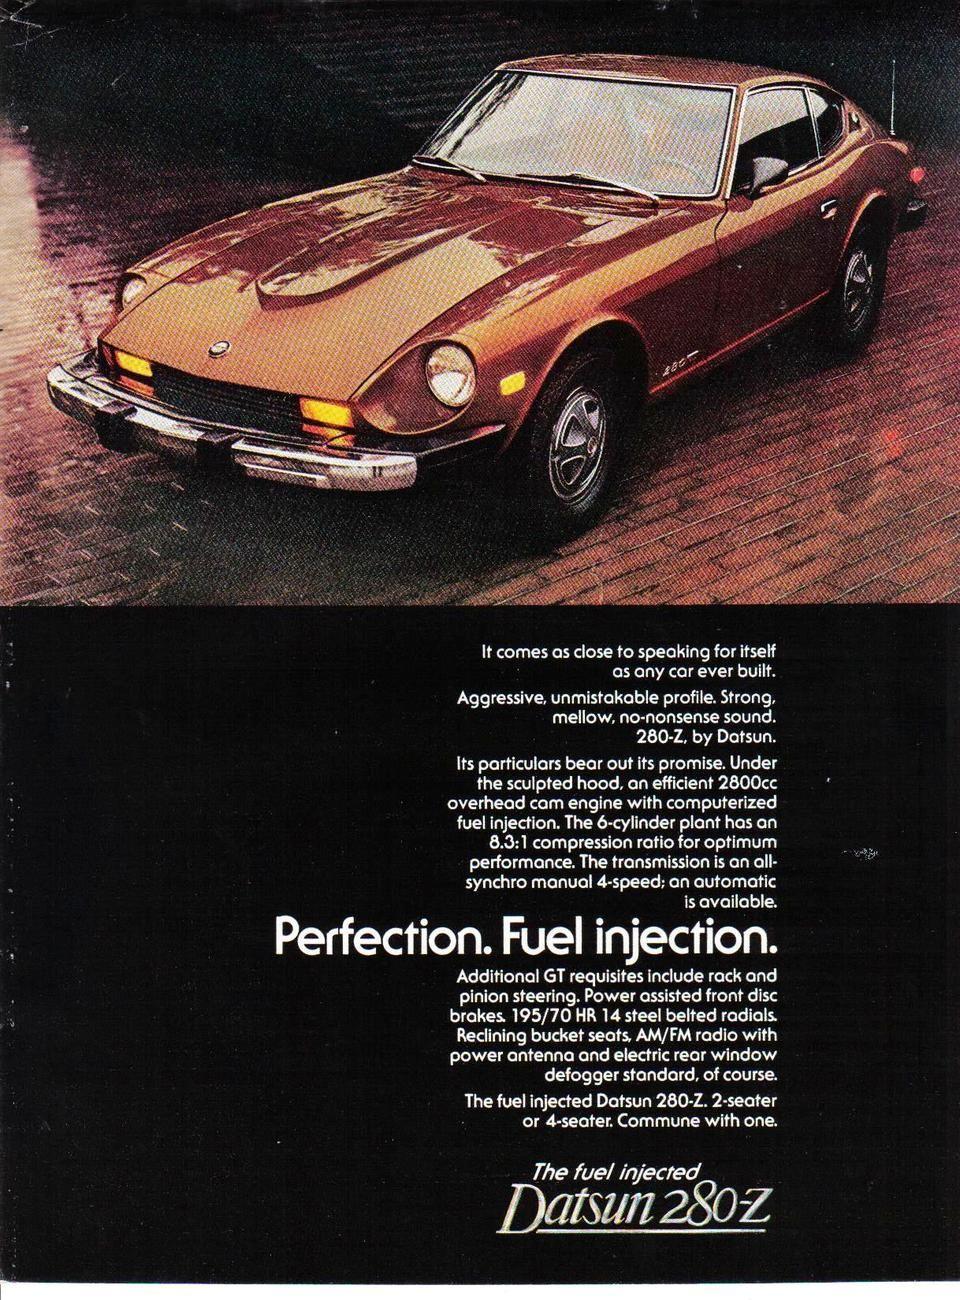 280-Z Datsun Original Full Page Print Ad - Collectible